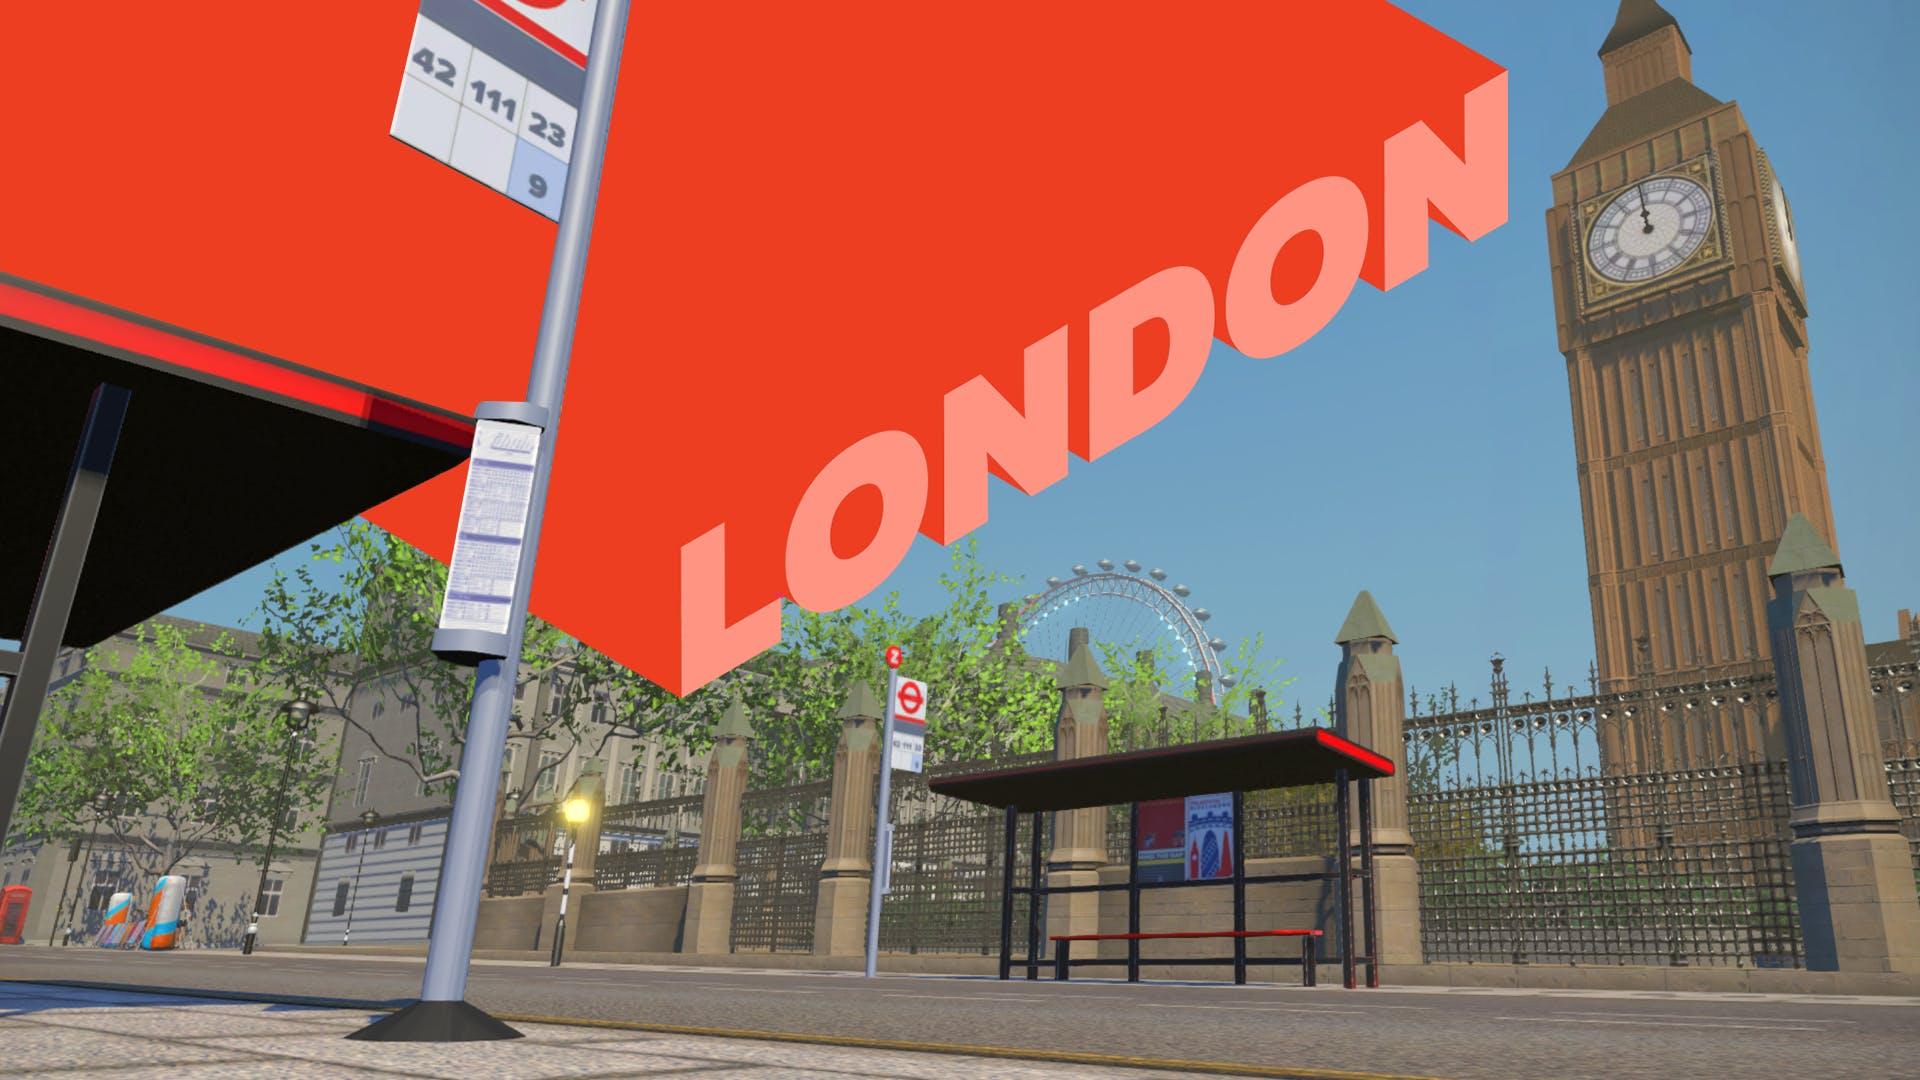 1. Etappe: London